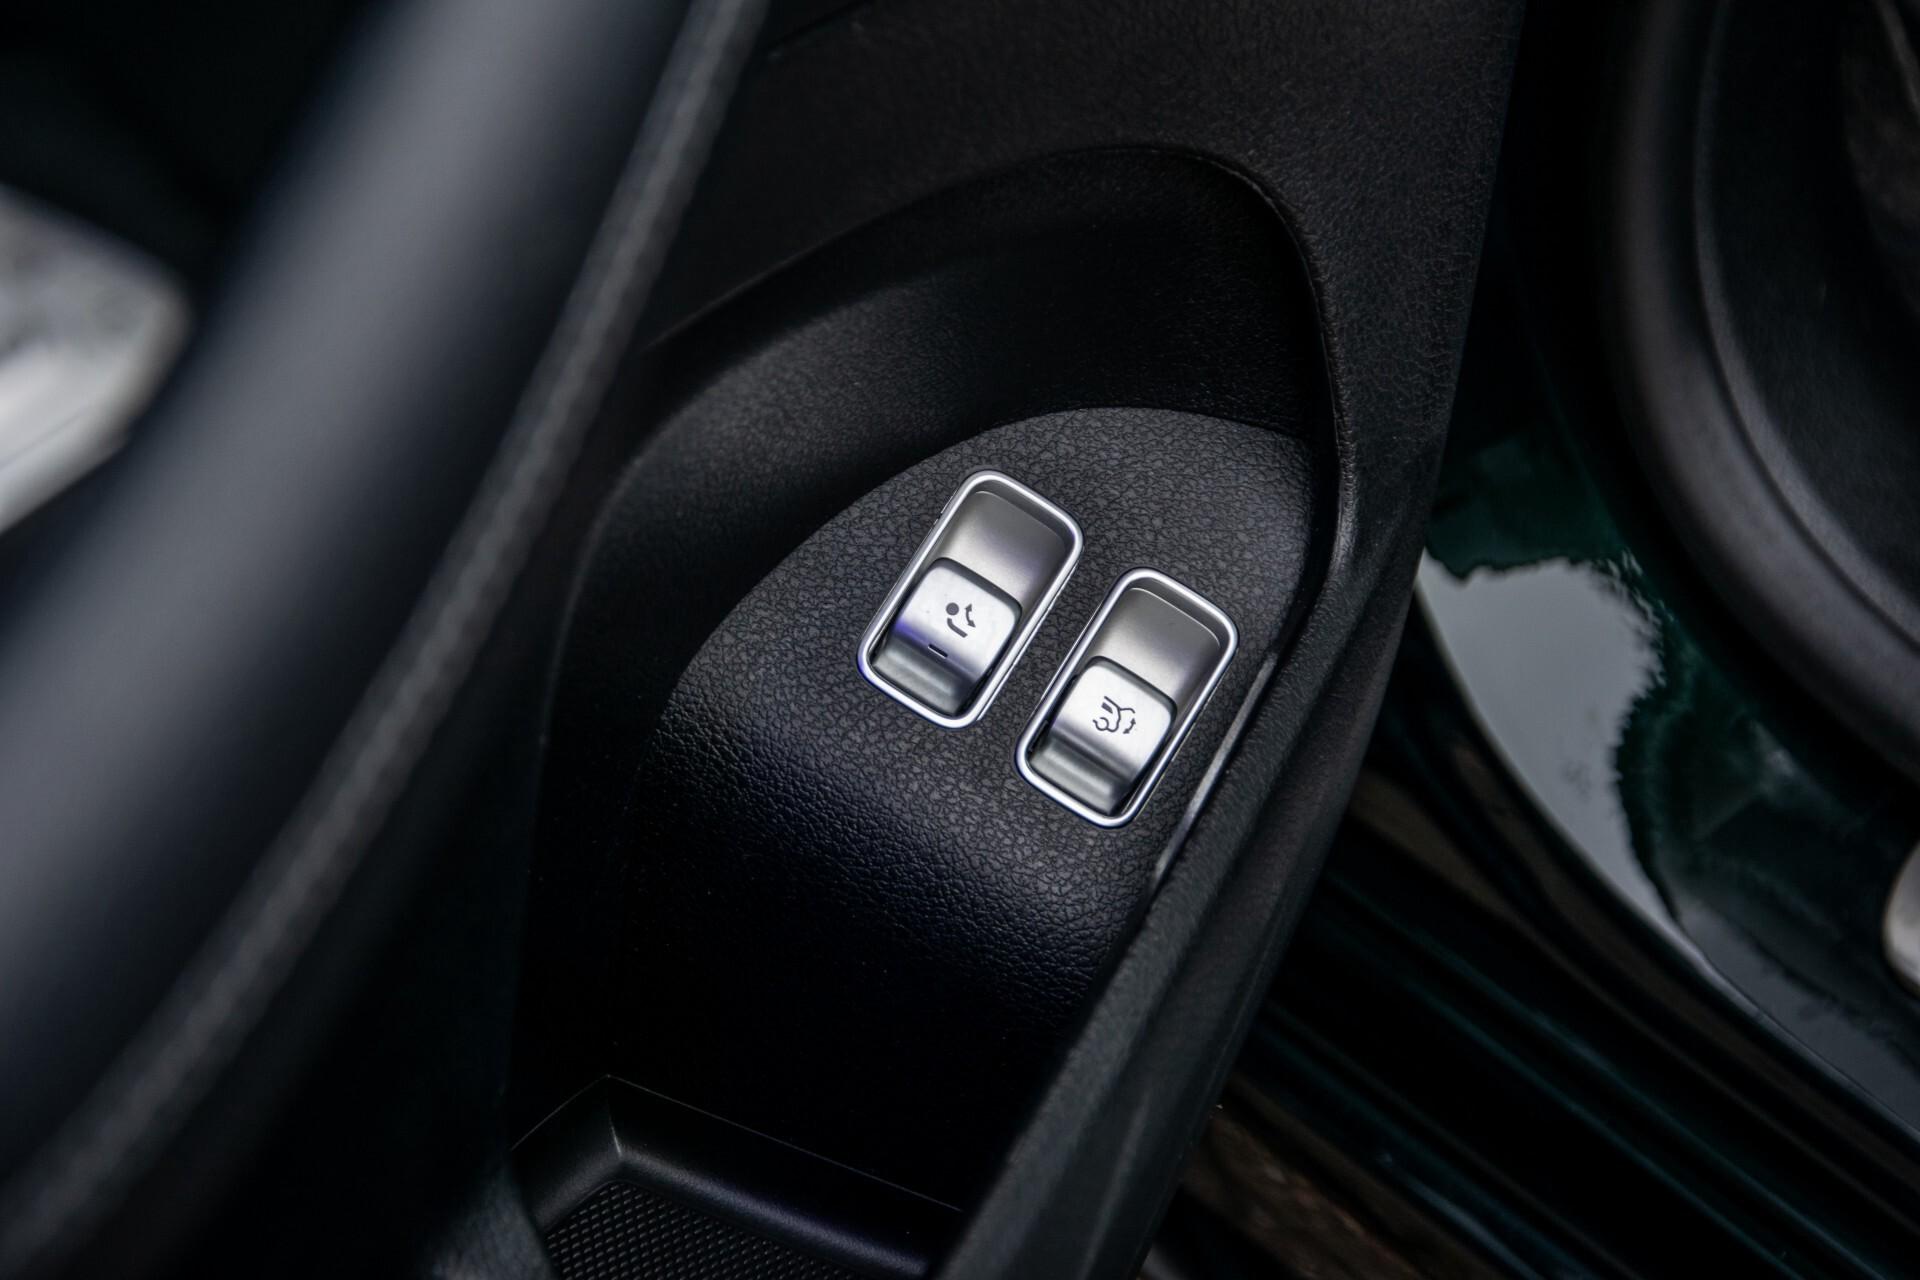 Mercedes-Benz GLE 450 4-M 7-Persoons AMG Massage/Rij-assist/Keyless/TV/360/Night/Trekhaak Aut9 Foto 27